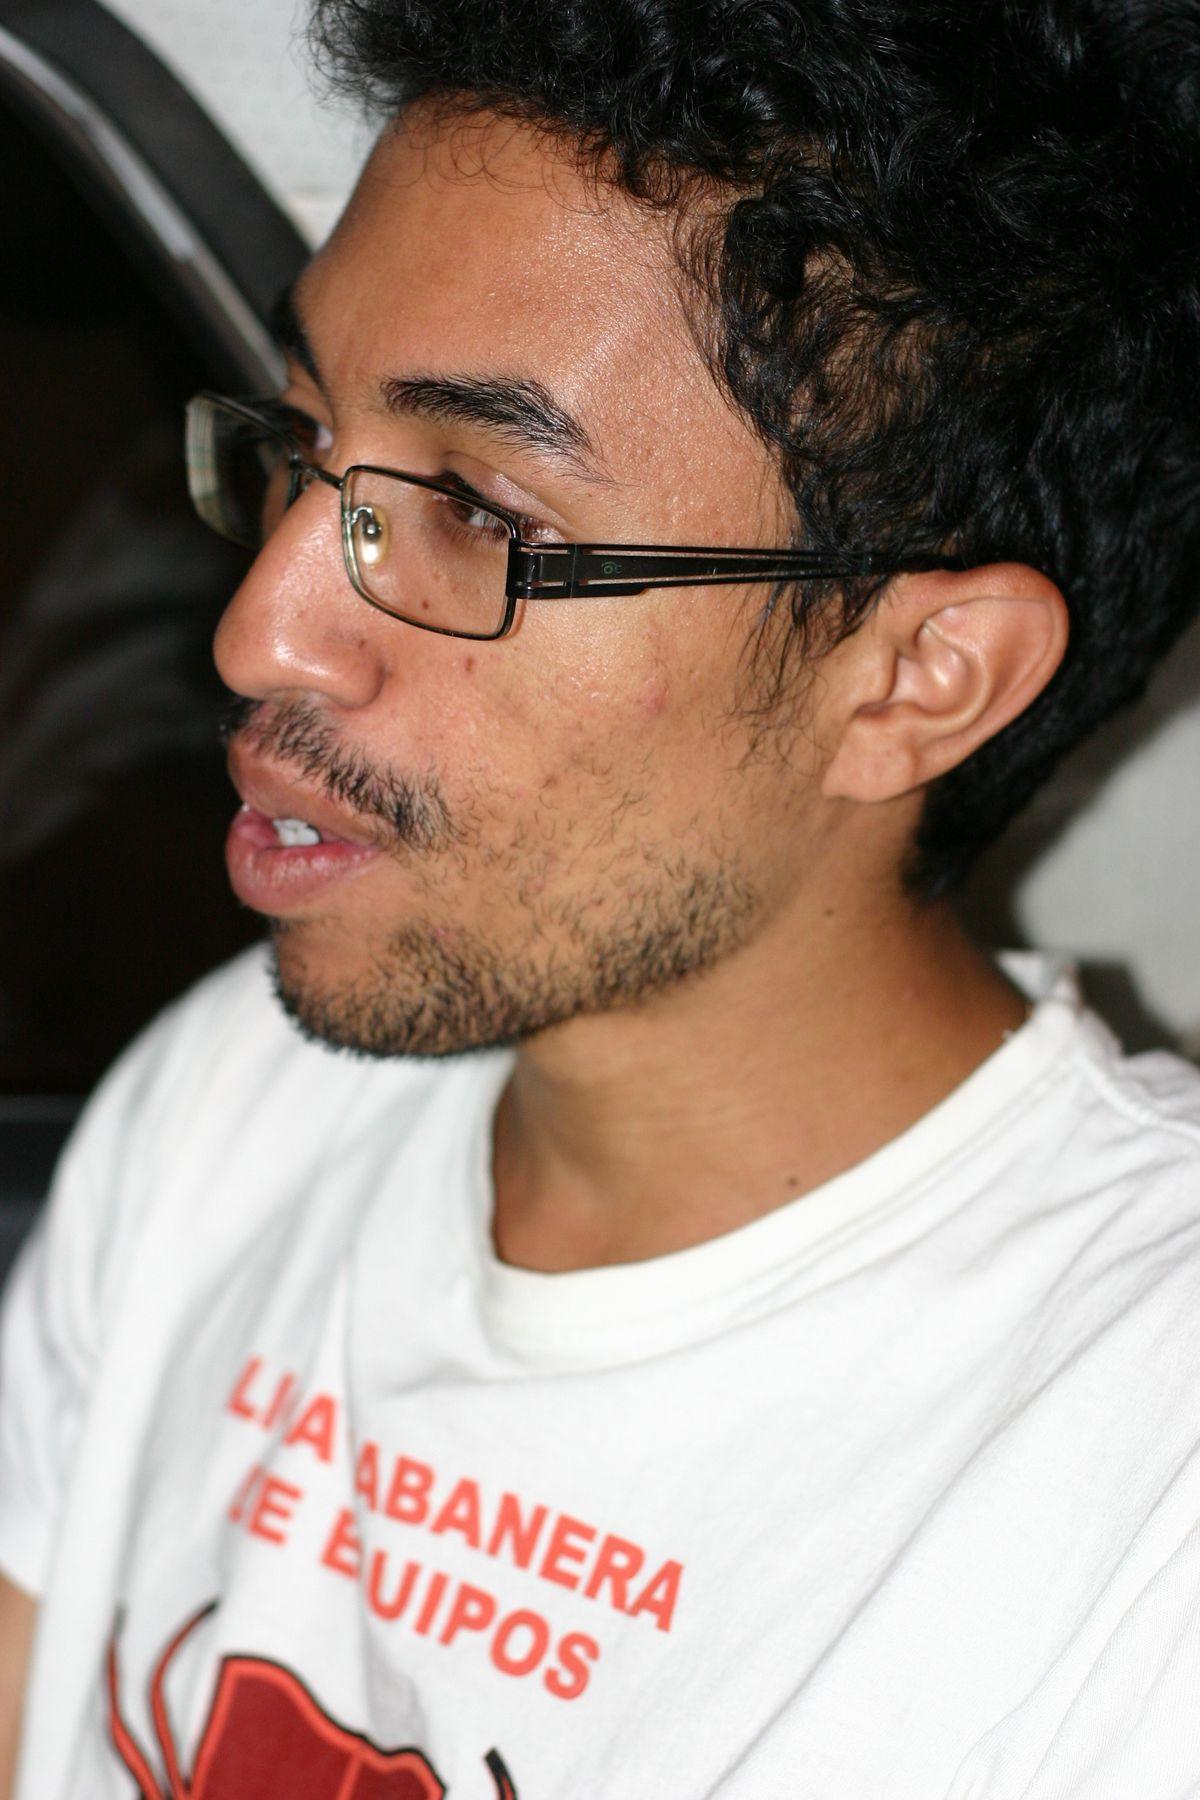 Ien Pedro Carbonell, president of ADEC